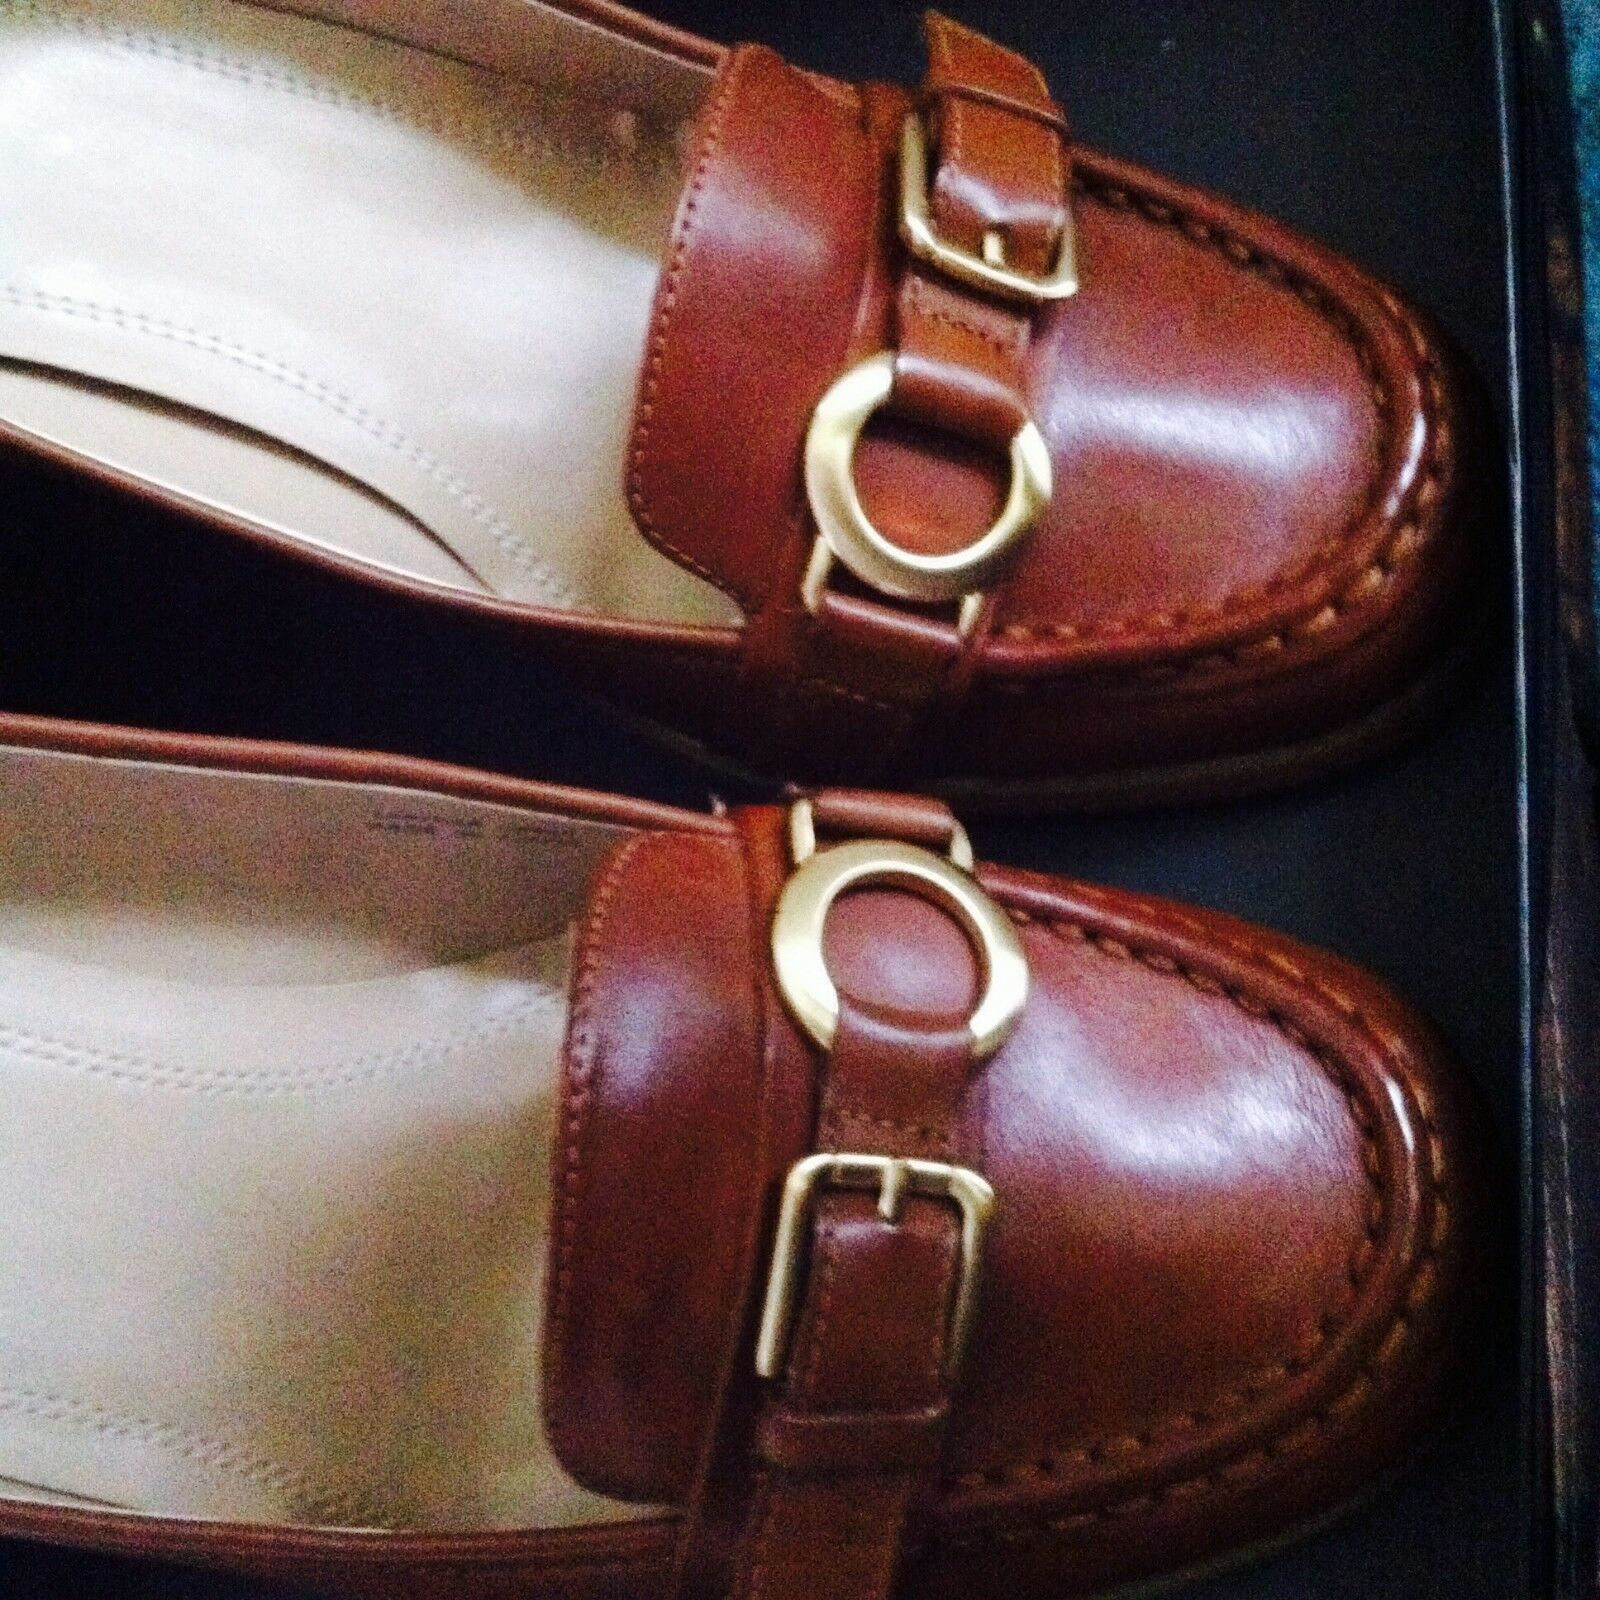 NEW Wmns Größe 11 ELLEN Block TRACY Genuine Leder Schuhes Block ELLEN Heel Pump COGNAC BROWN e00760